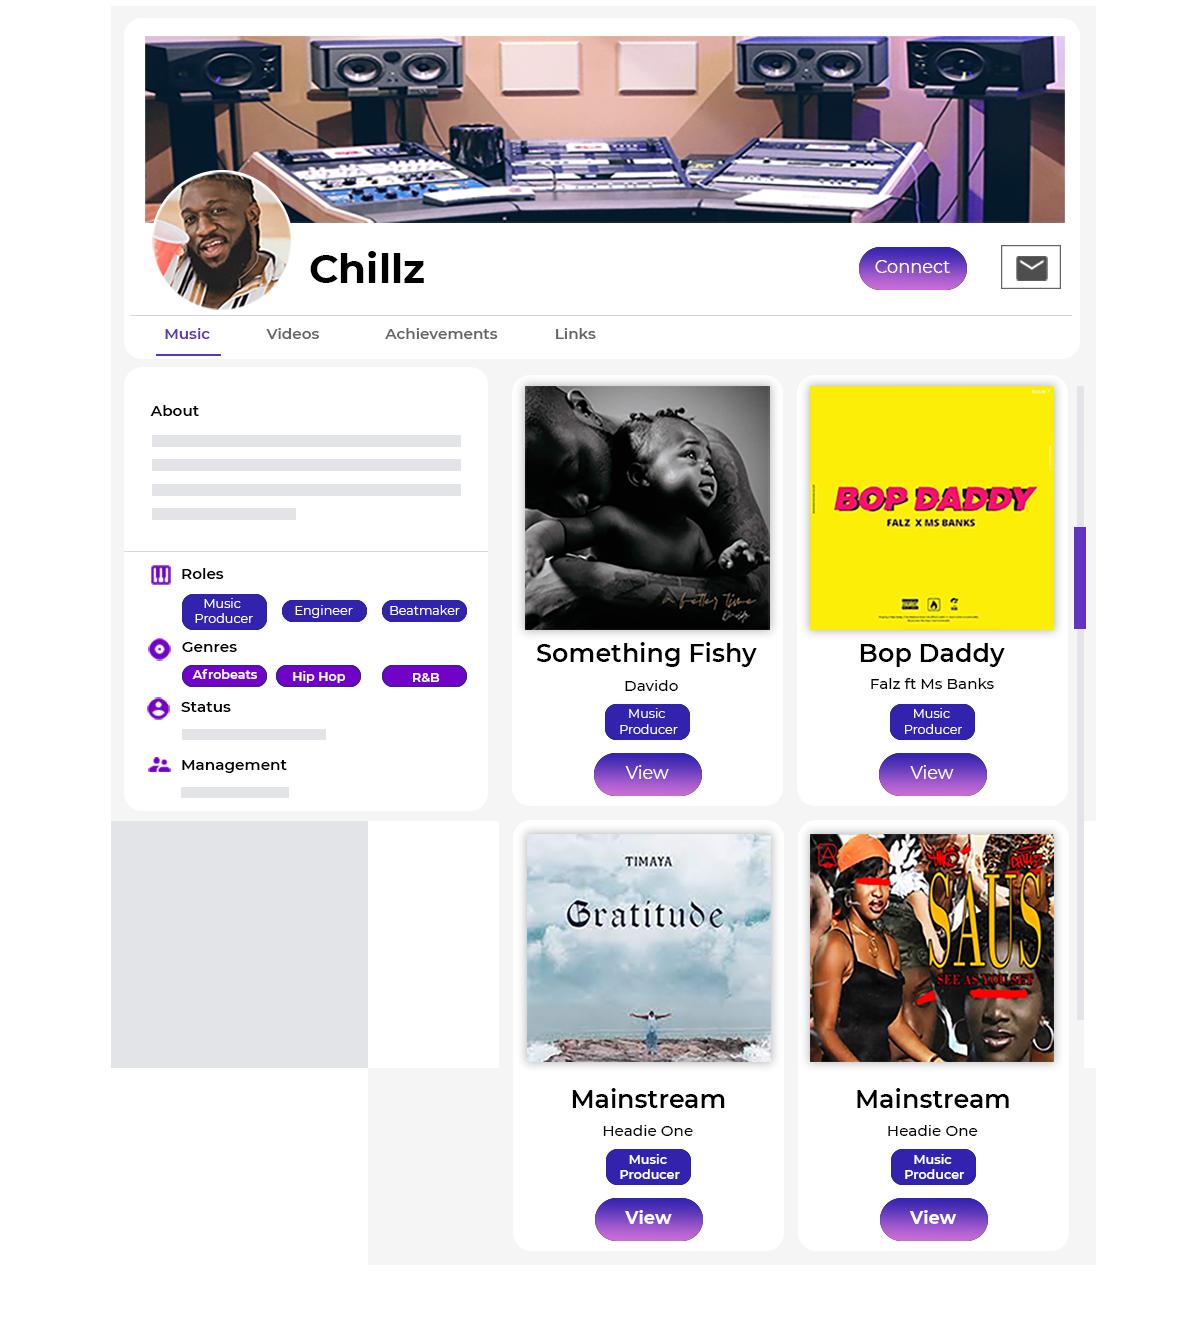 Chillz Artist, Creditz Music